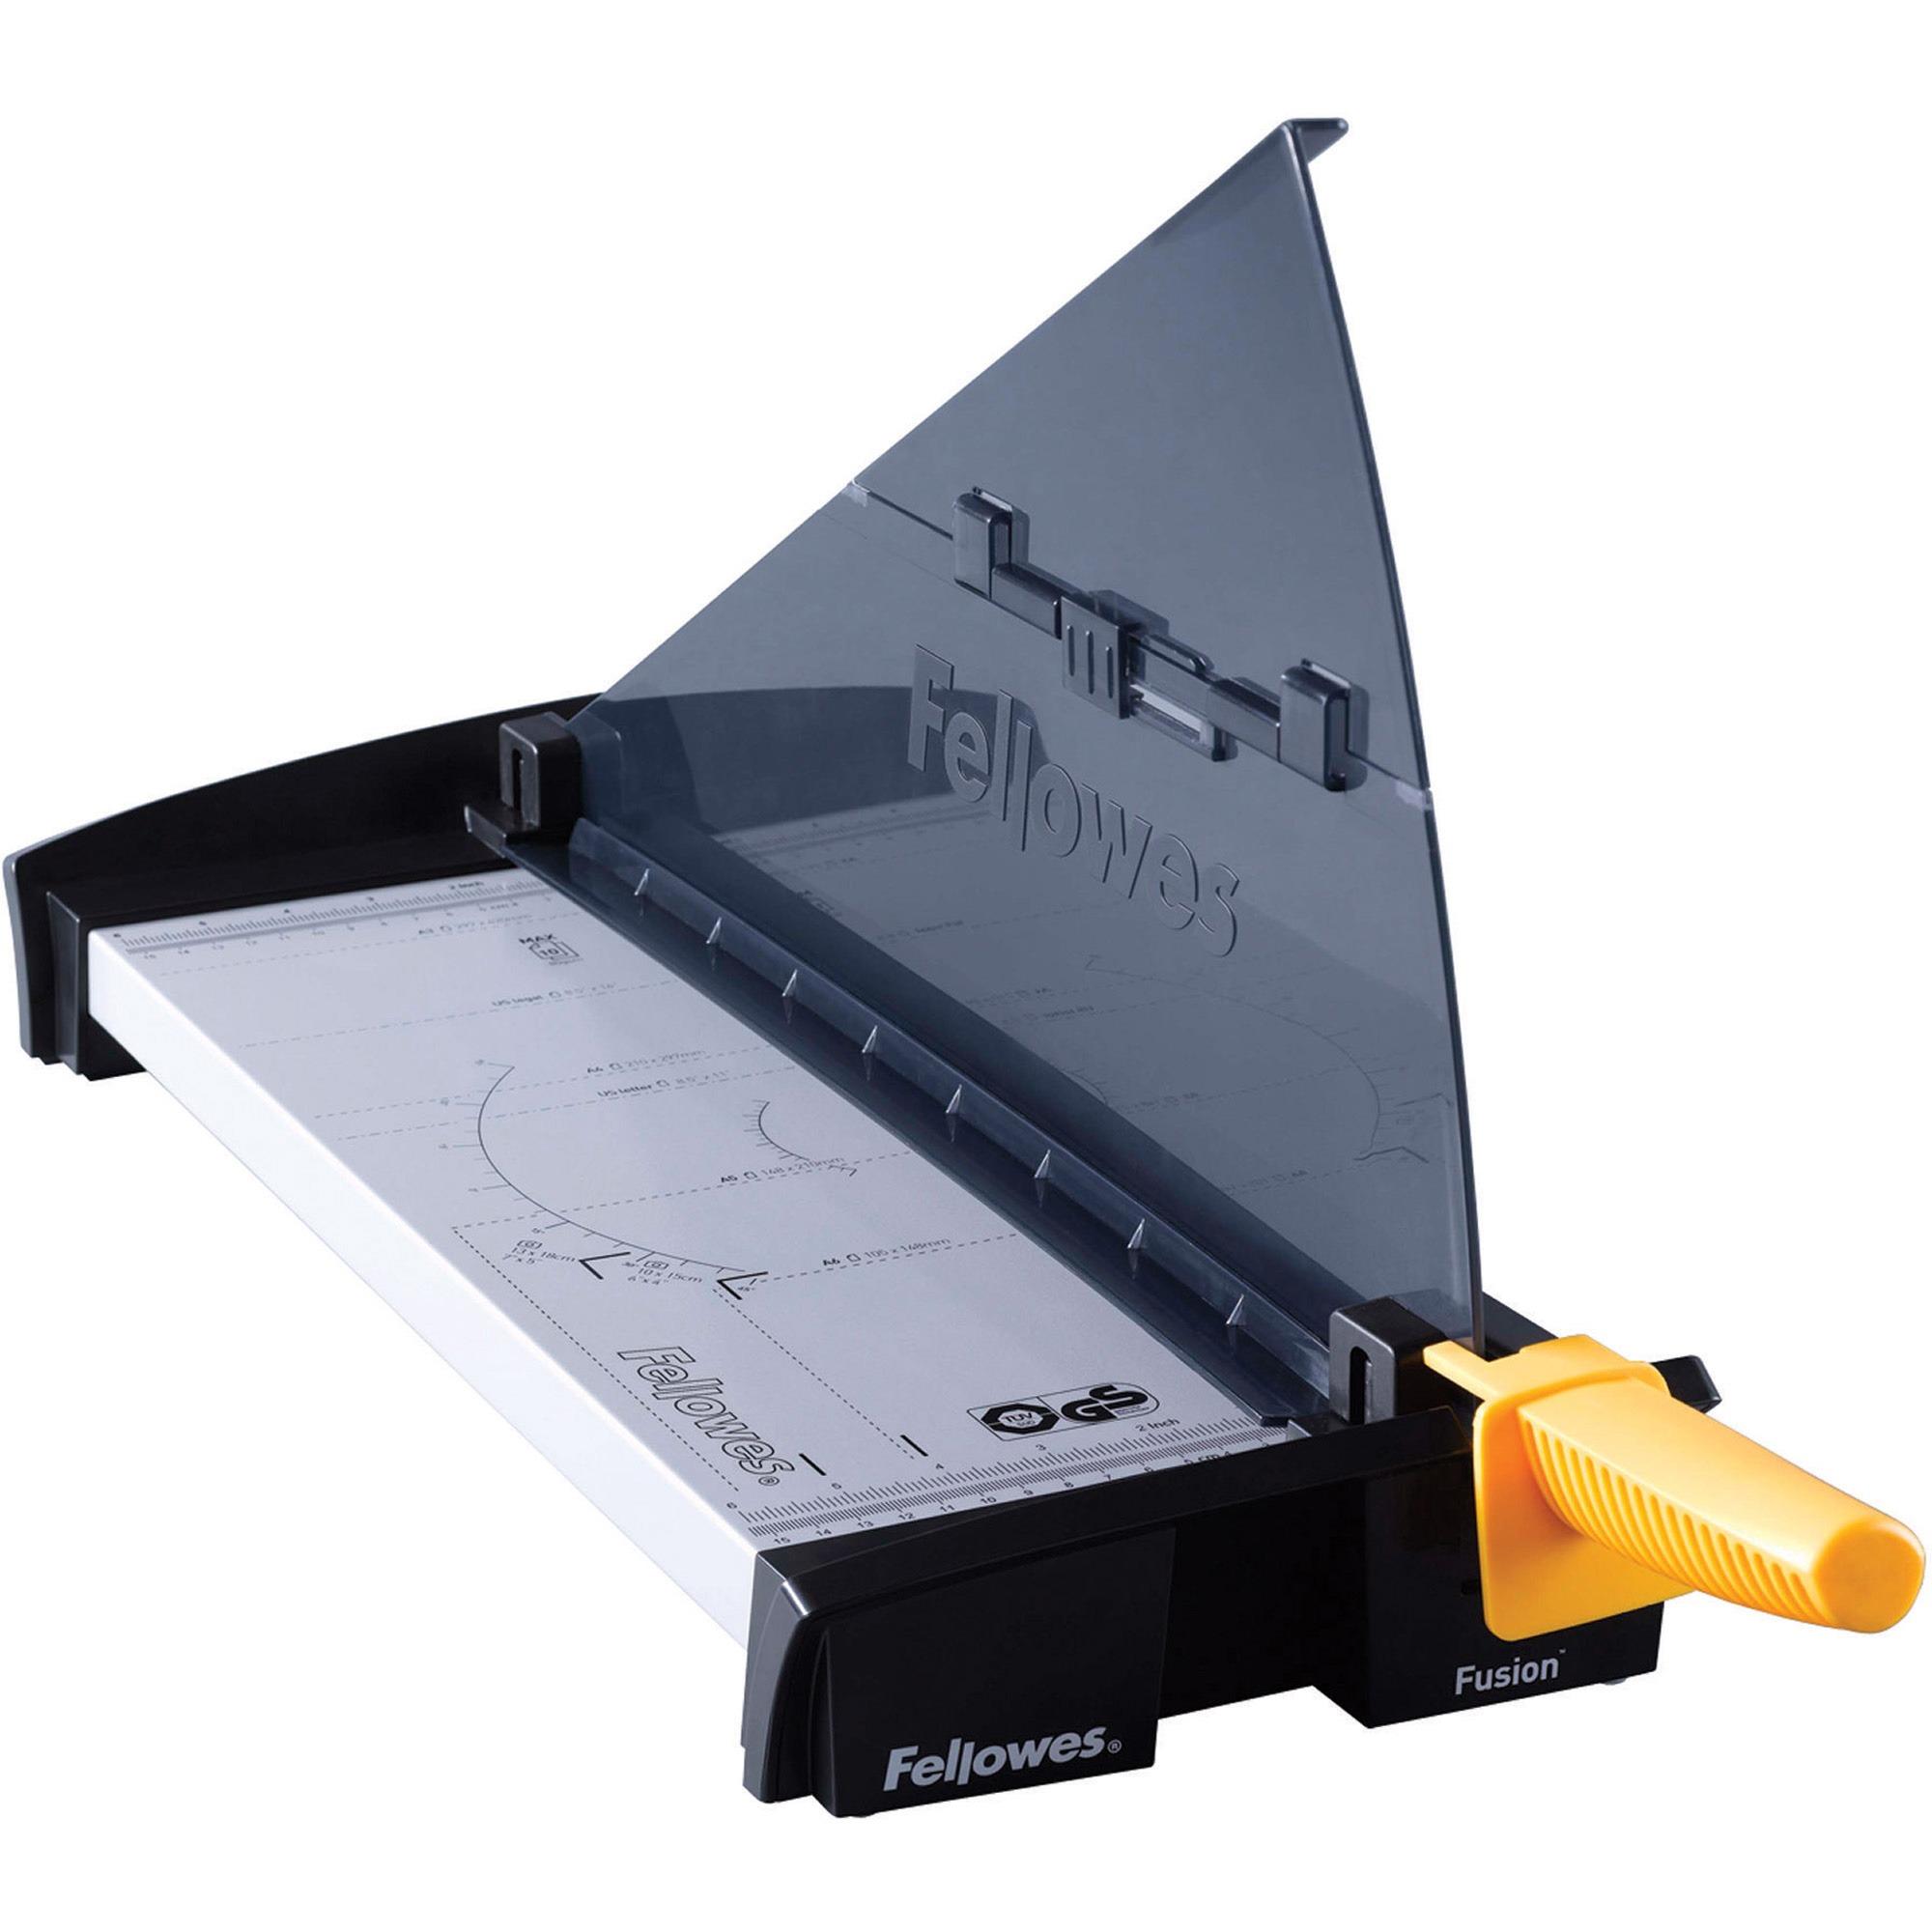 Fellowes, FEL5410902, Fusion 180 Paper Cutter, 1 Each, Black,Silver